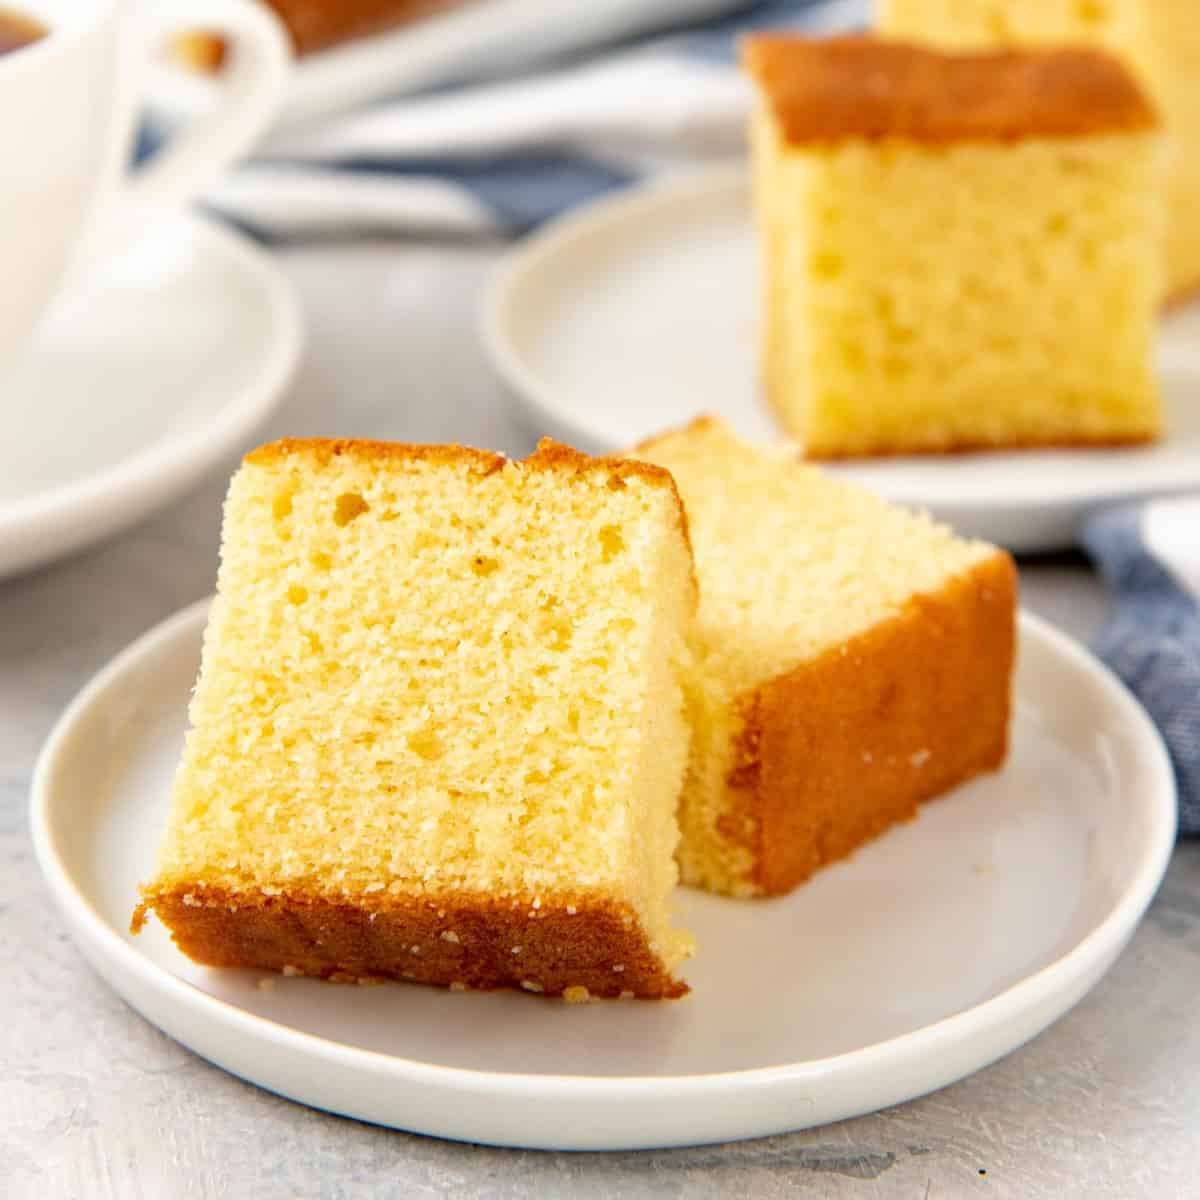 Sri Lankan Butter Cake Authentic Recipe The Flavor Bender